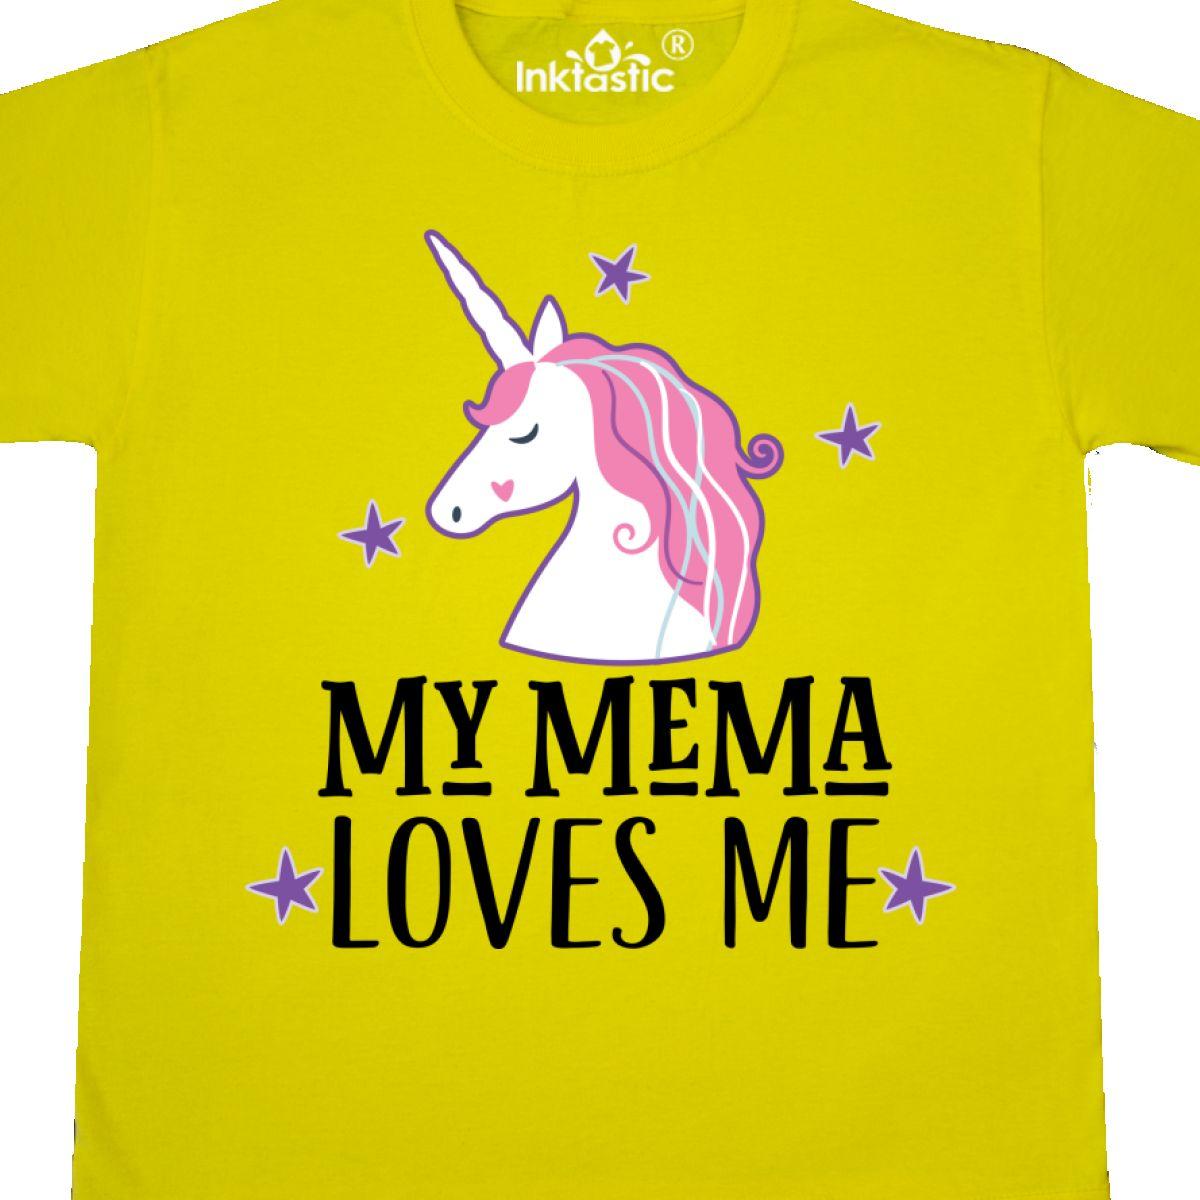 Inktastic My Mema Loves Me Girl Unicorn Youth T-Shirt Childs Grandchild Apparel